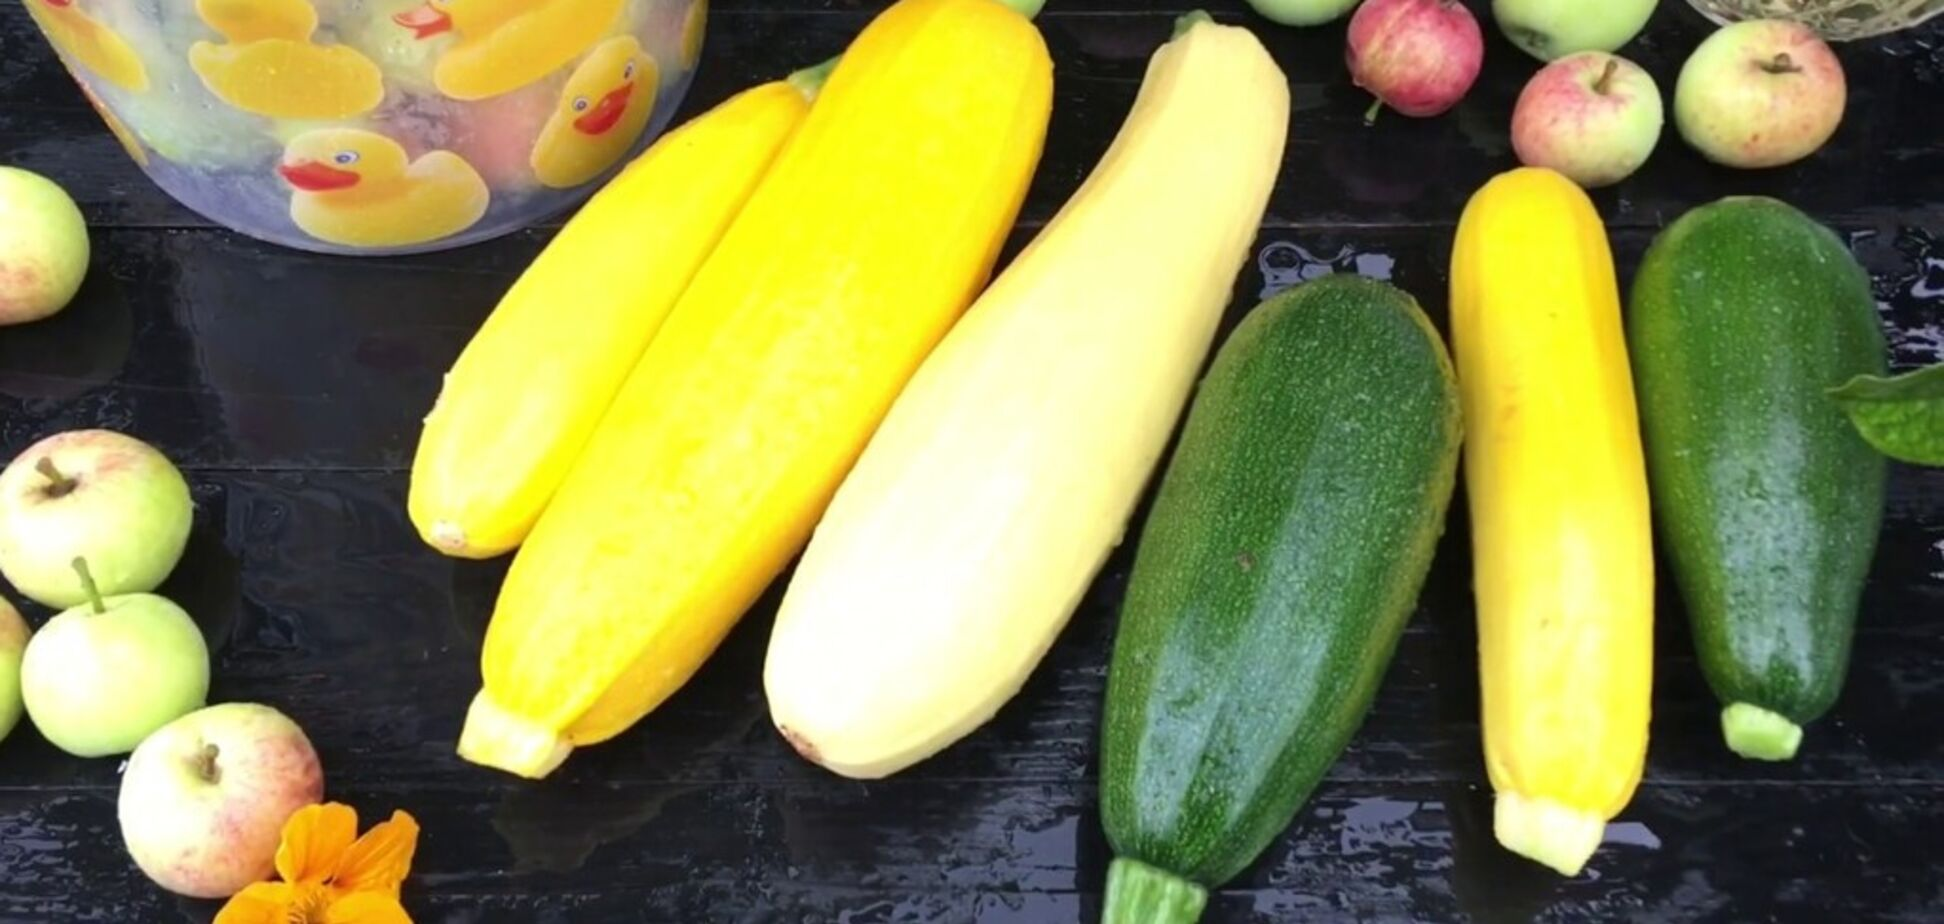 Рецепт надсмачної страви з кабачків